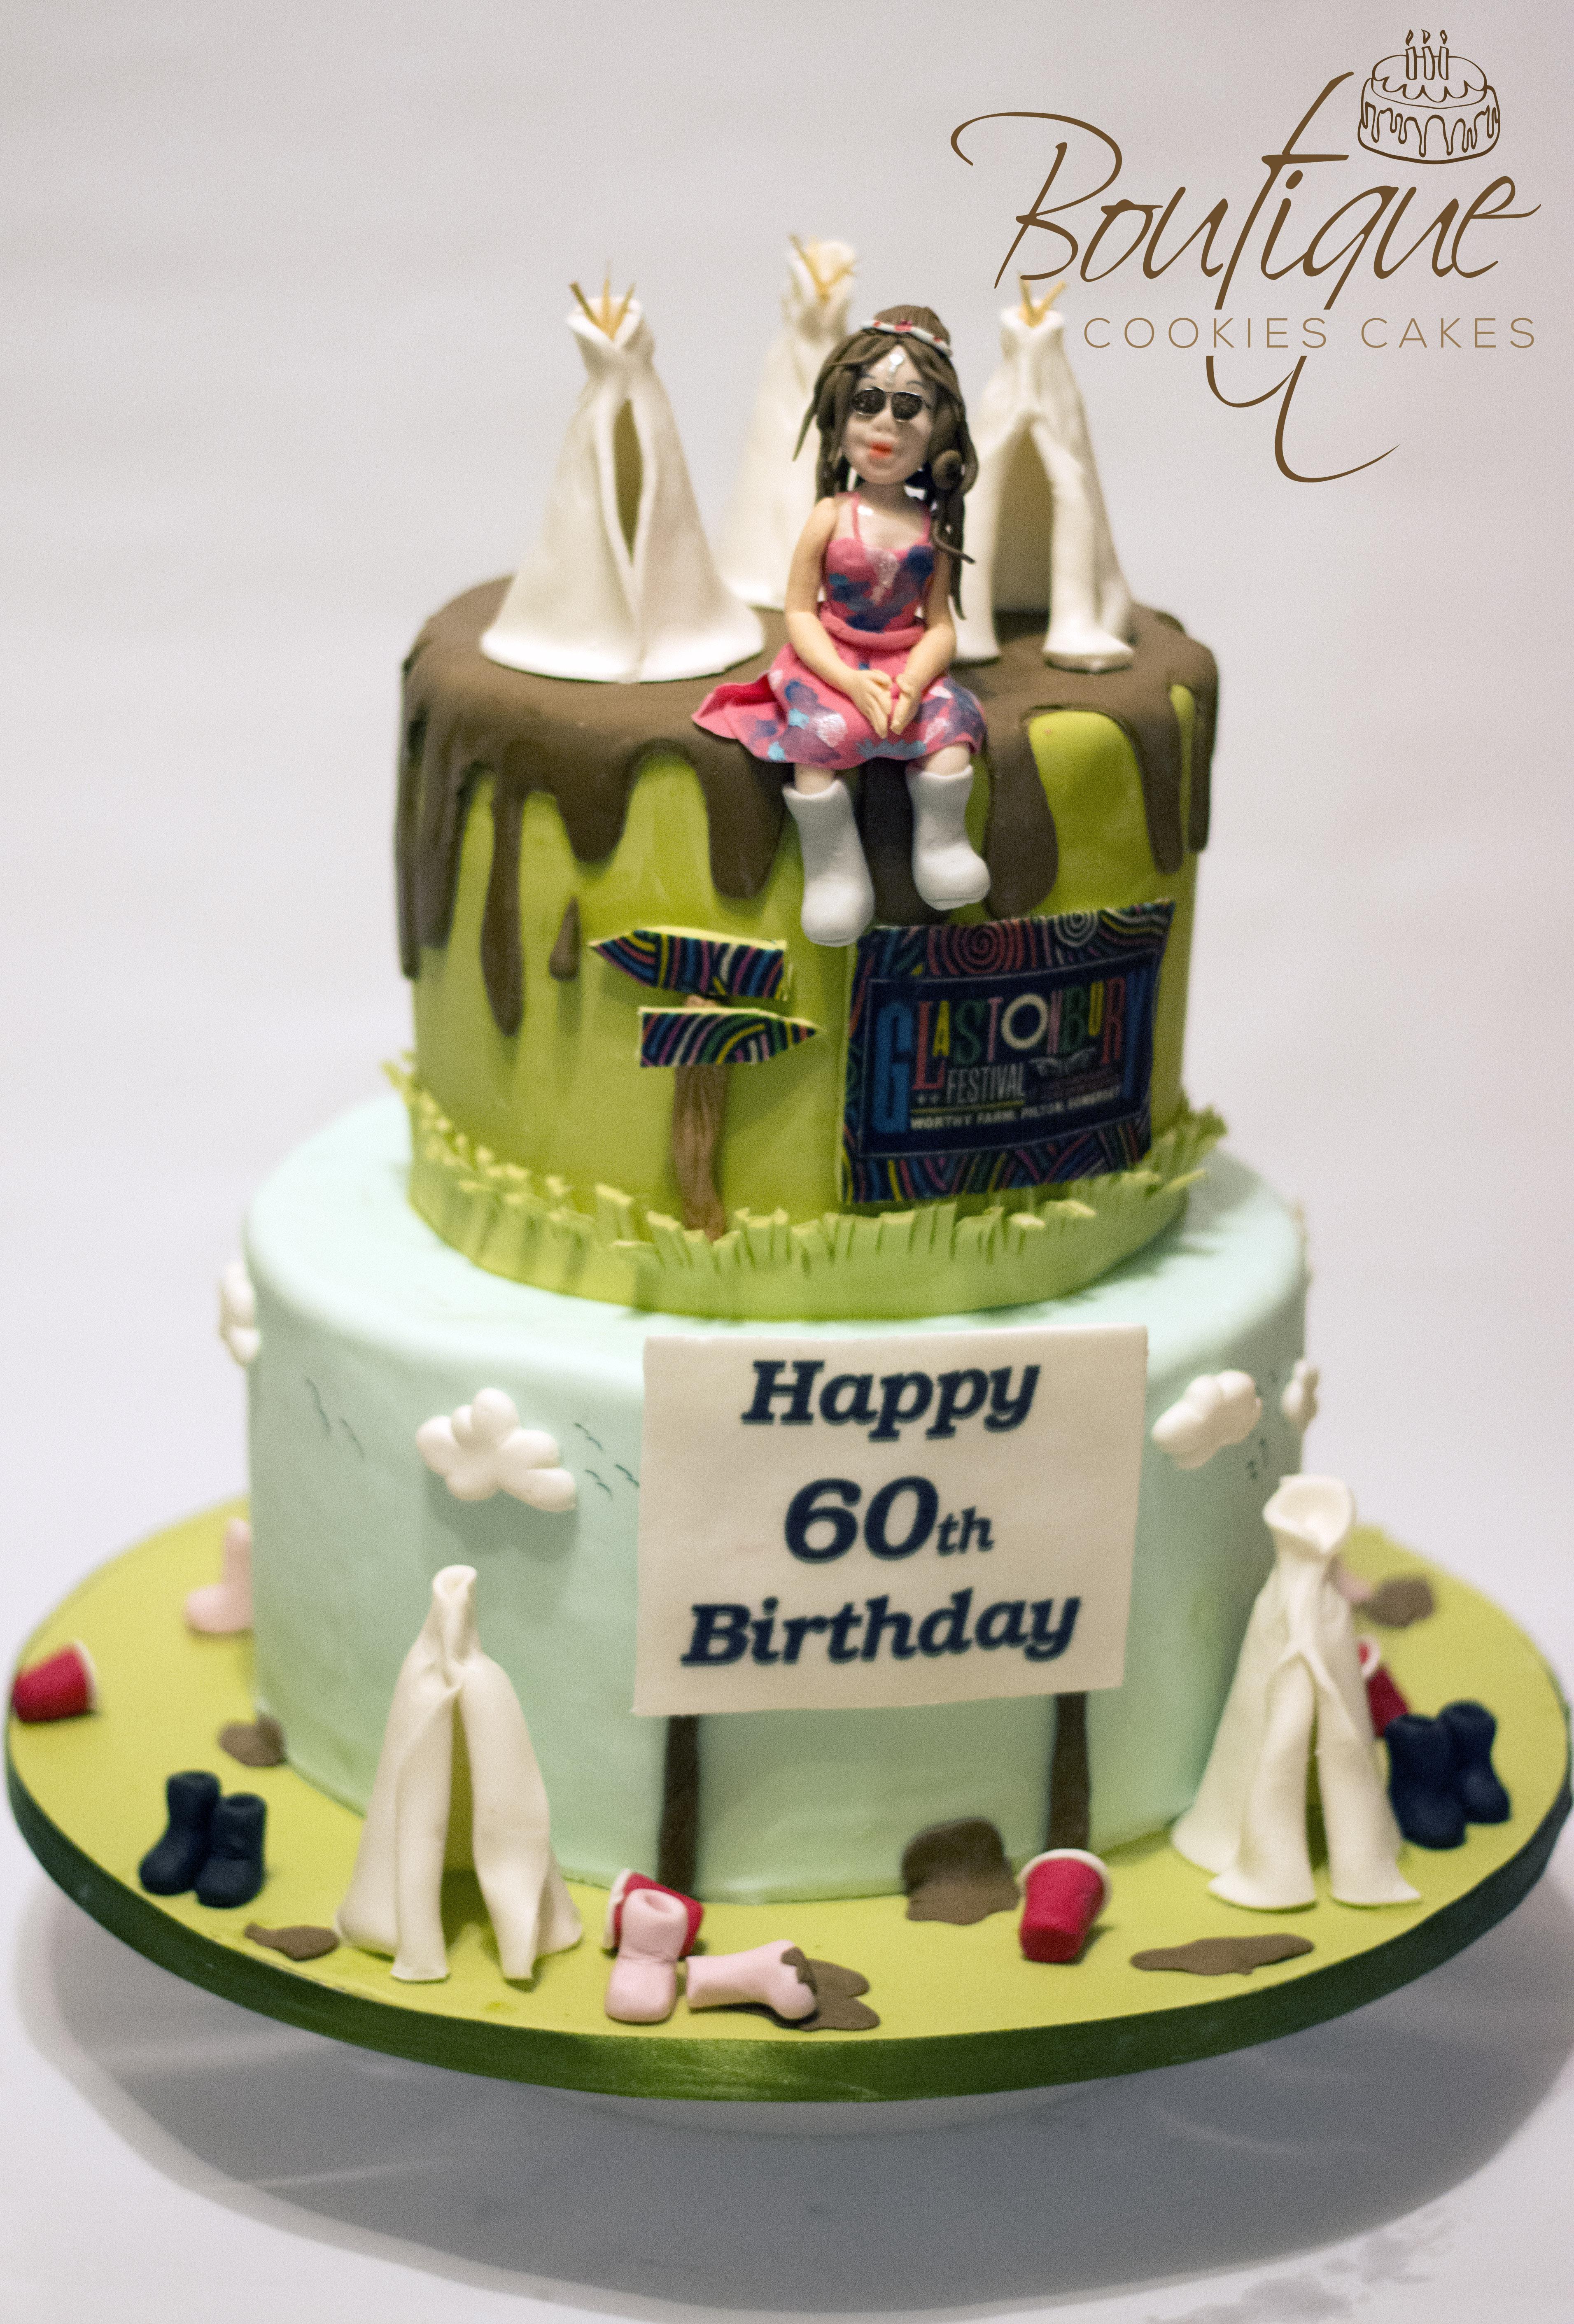 Glastonbury festival cake 1